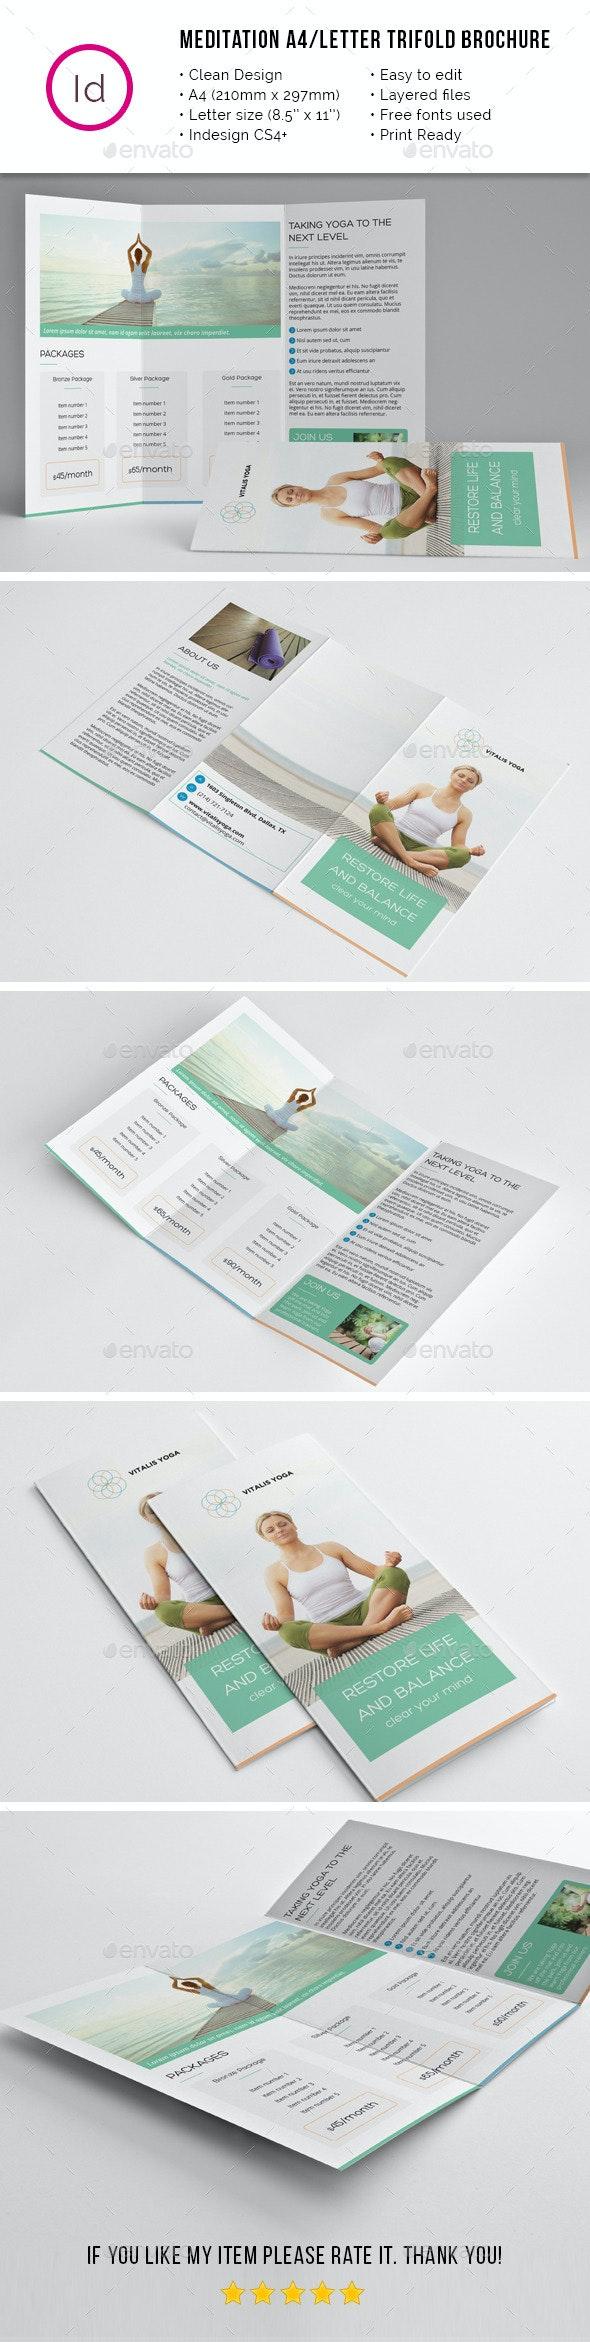 Yoga Meditation A4 / Letter Trifold Brochure - Corporate Brochures